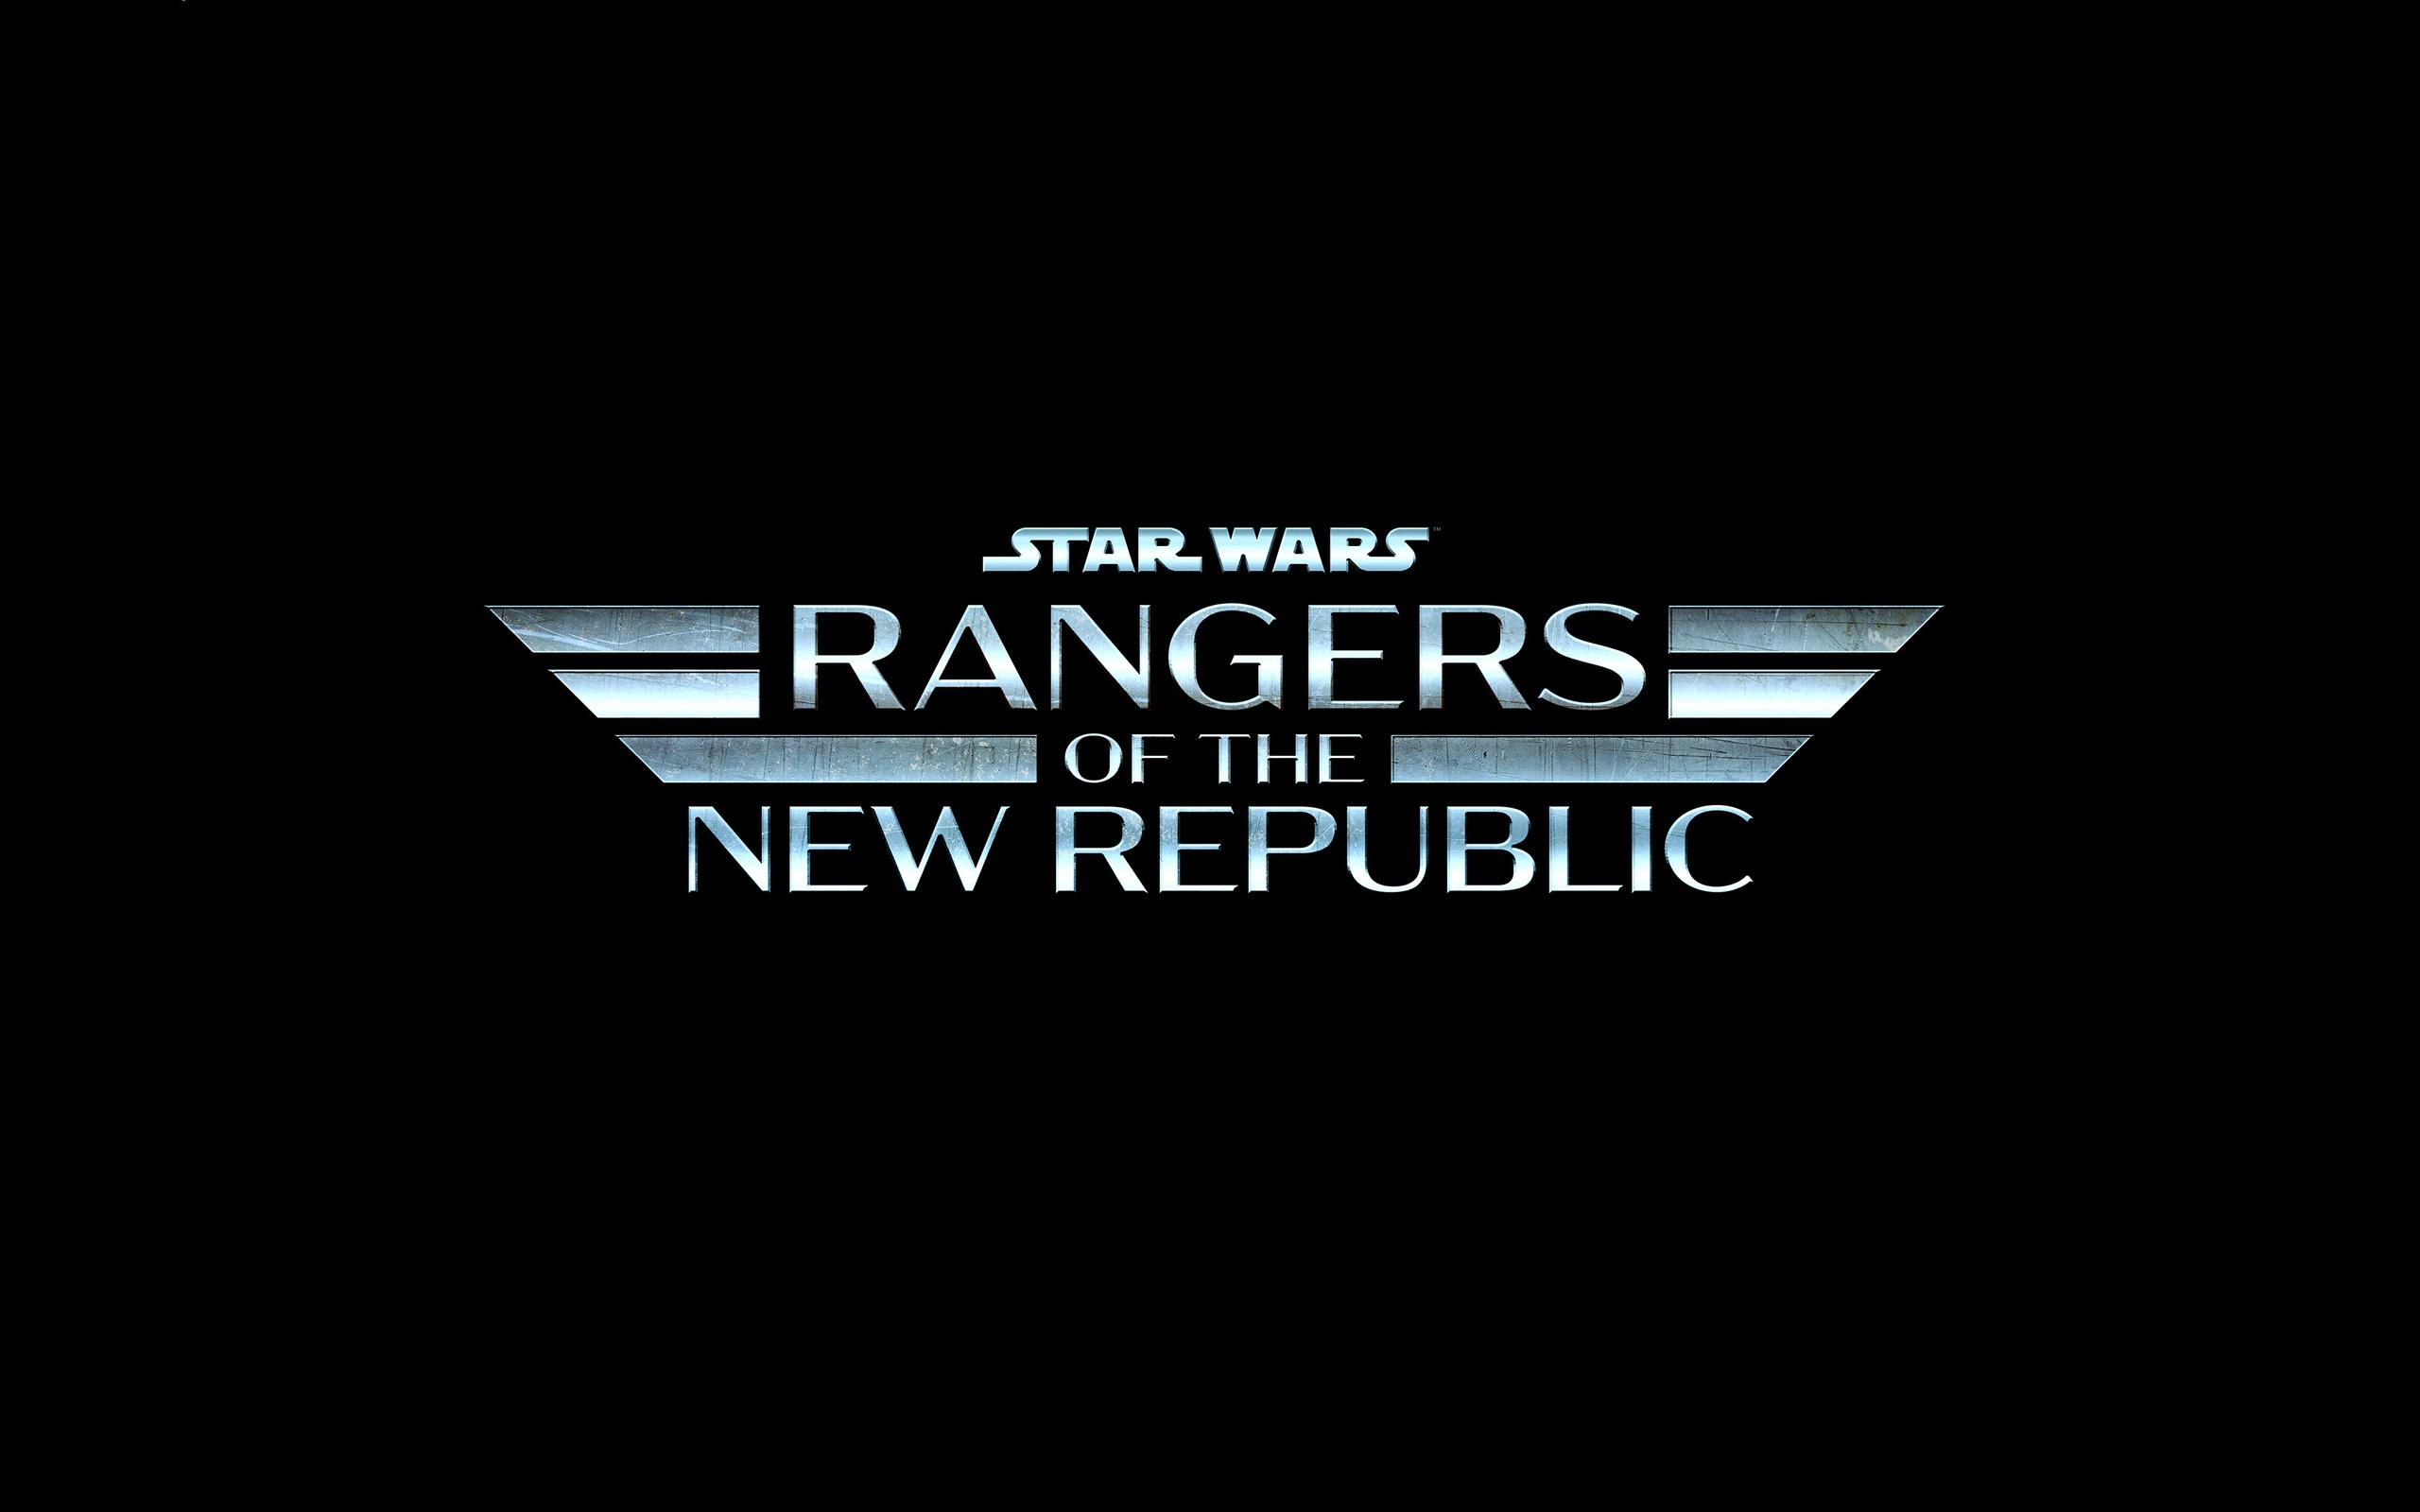 star-wars-rangers-of-the-new-republic-d7.jpg